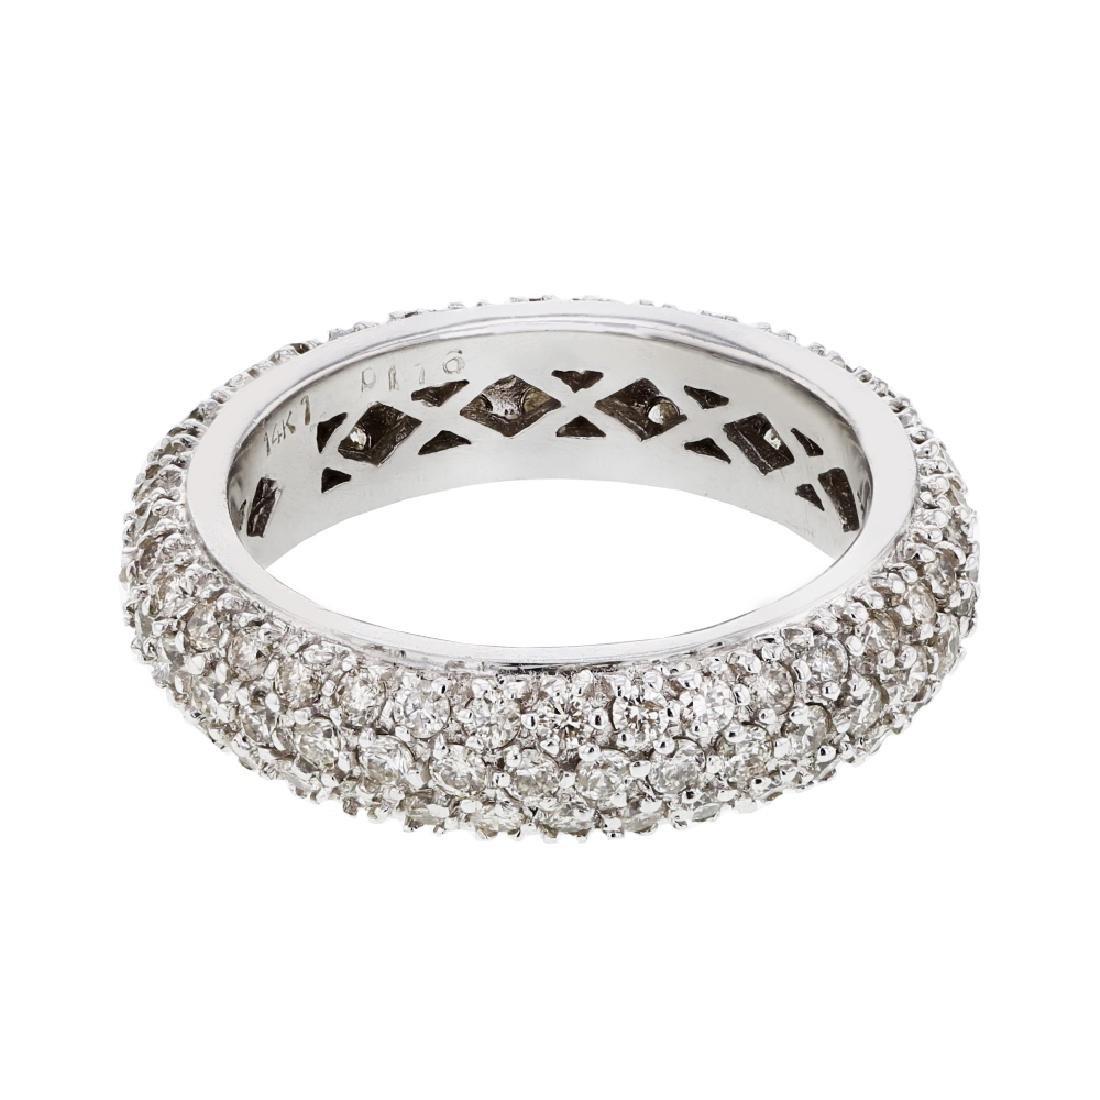 1.76 CTW Diamond Wedding Band  Ring in 14K White Gold